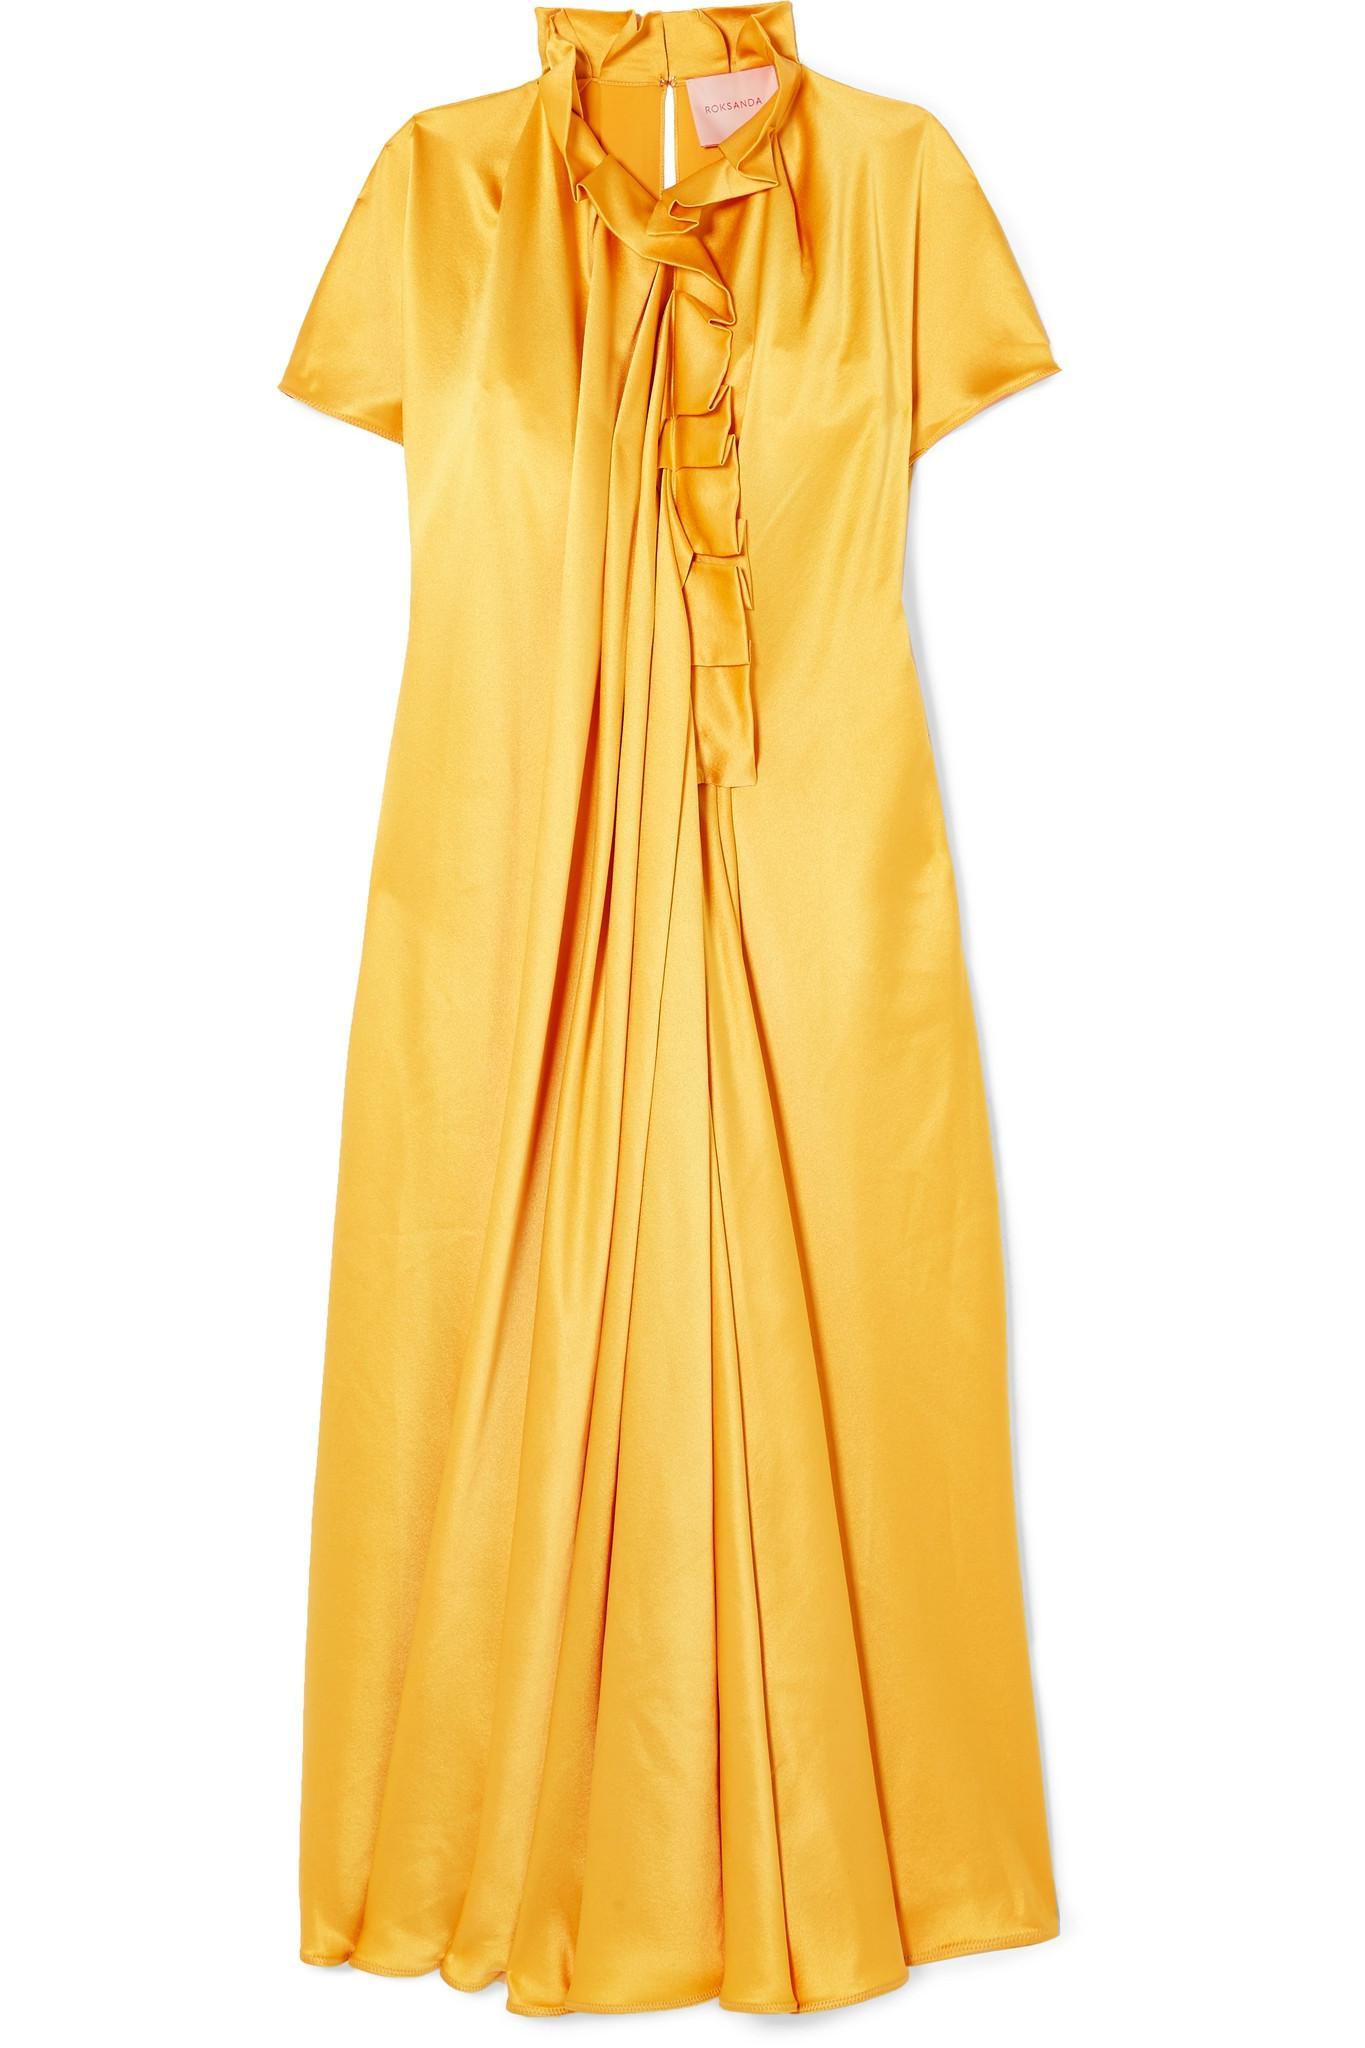 Idalia Pinstriped Cotton And Silk-blend Shirt Dress - Off-white Roksanda Ilincic 0gvcTxn